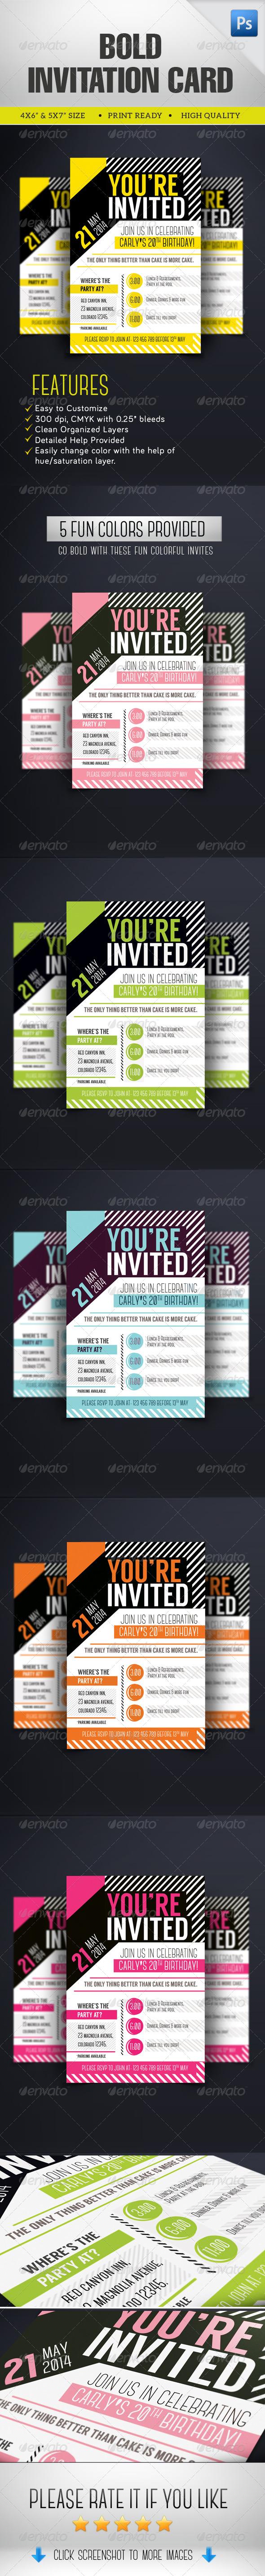 bold-invitation